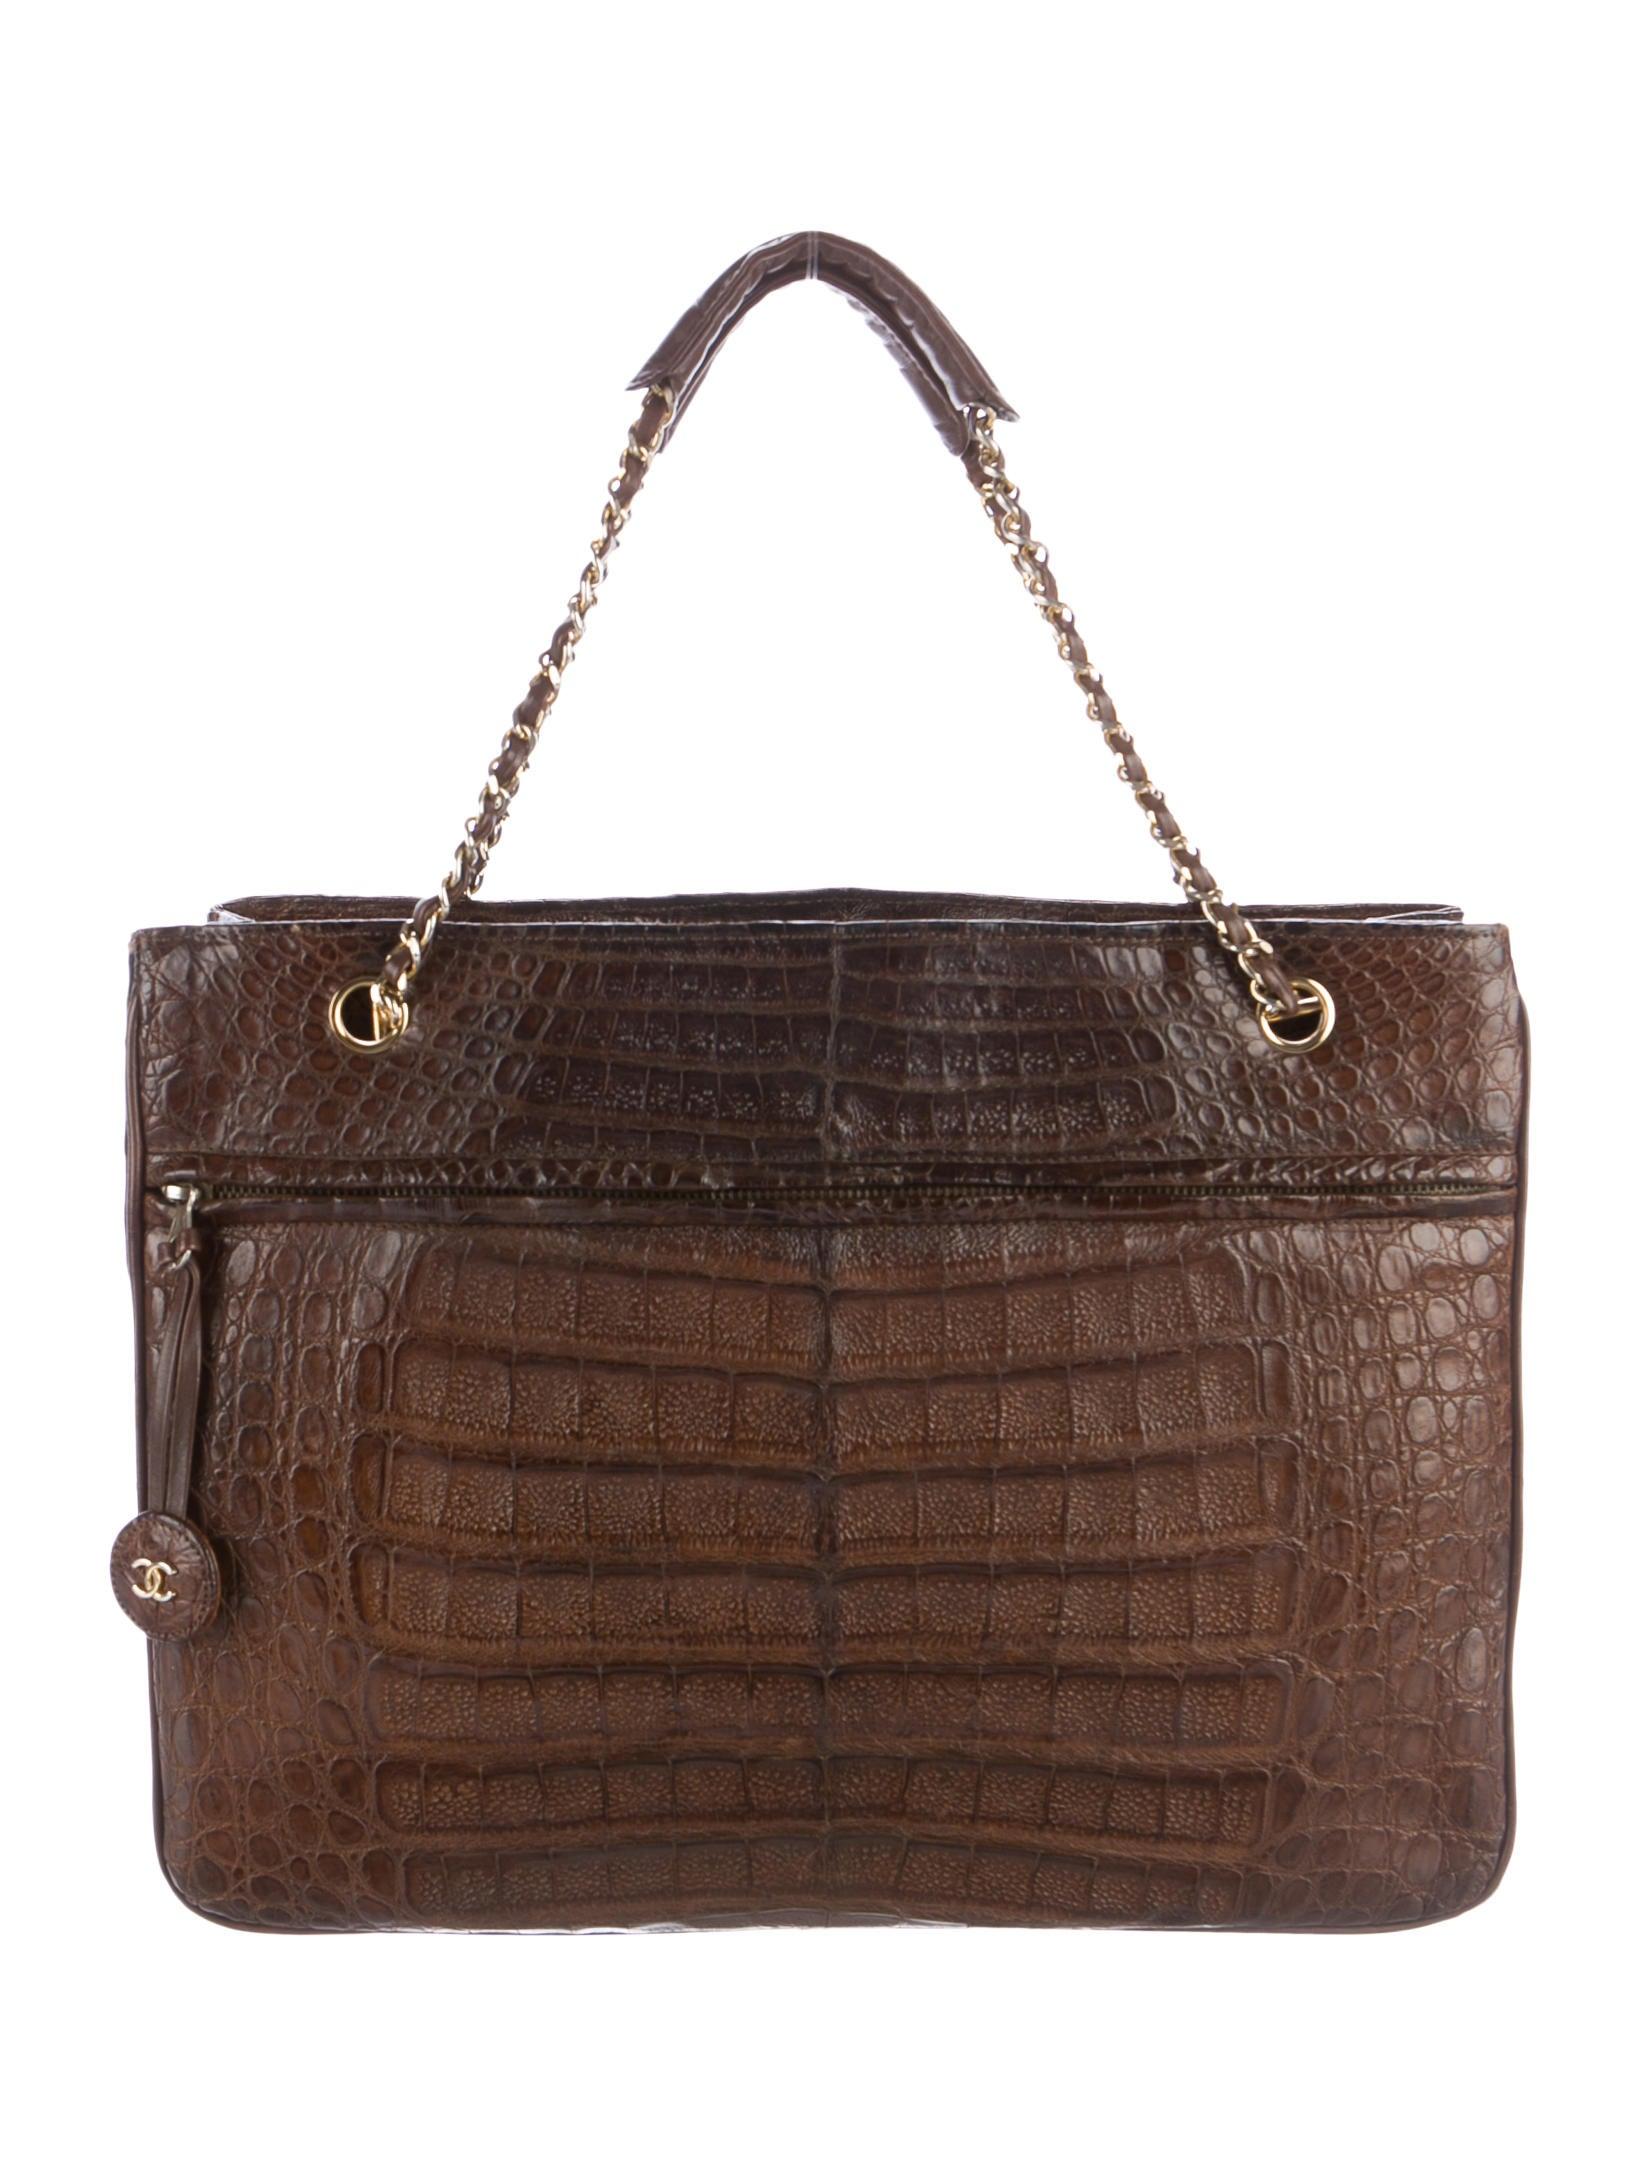 chanel vintage croc handbag don't they